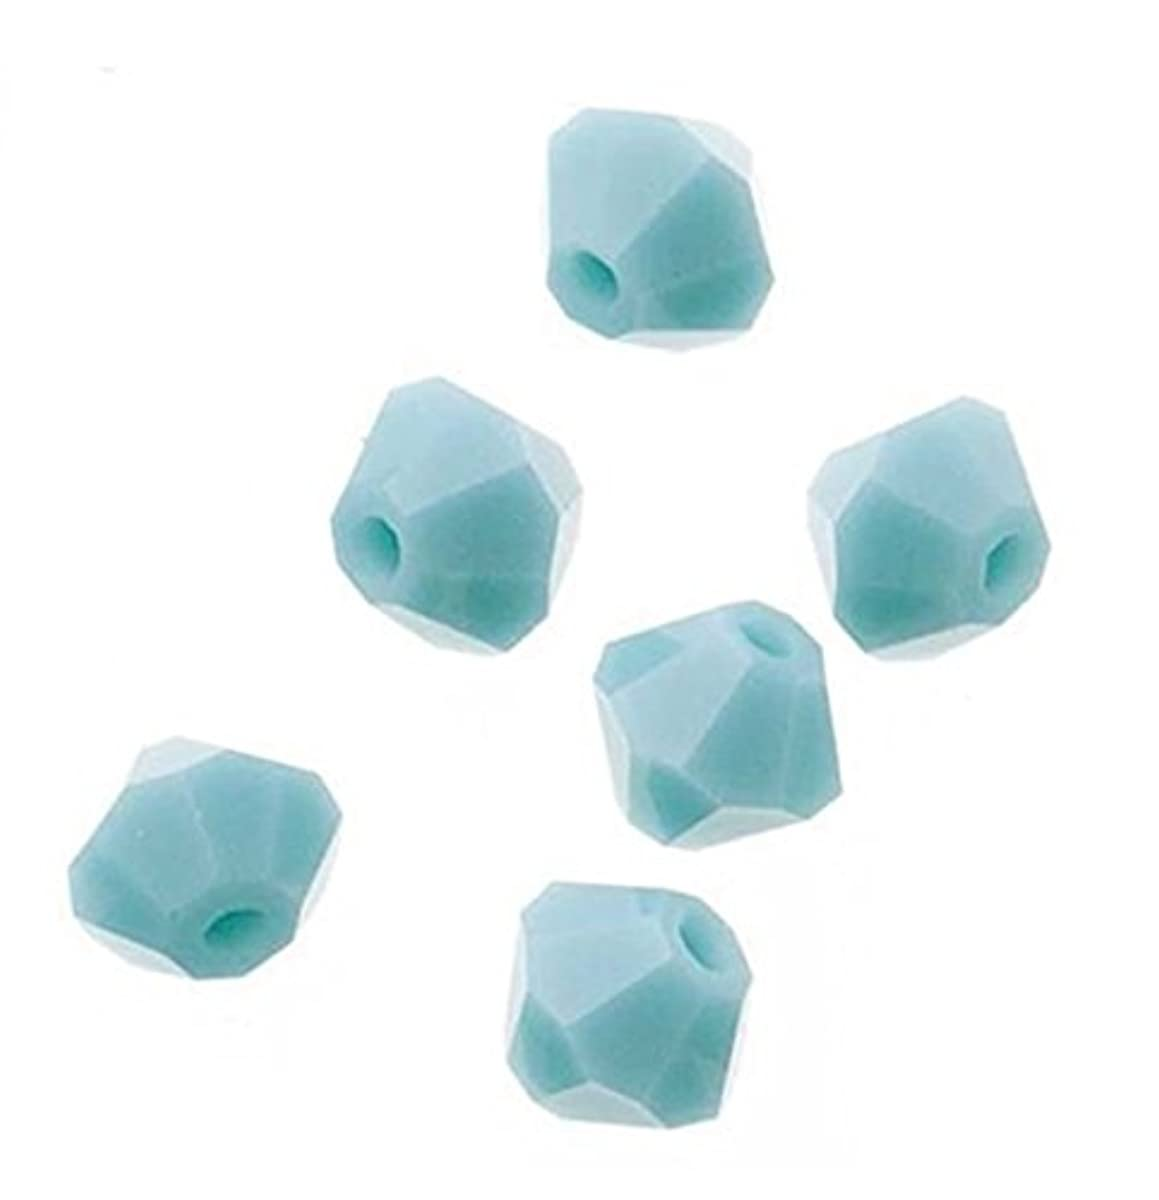 100pcs Genuine Preciosa Bicone Crystal Beads 4mm Turquoise Opal Alternatives For Swarovski #5301/5328 #preb446